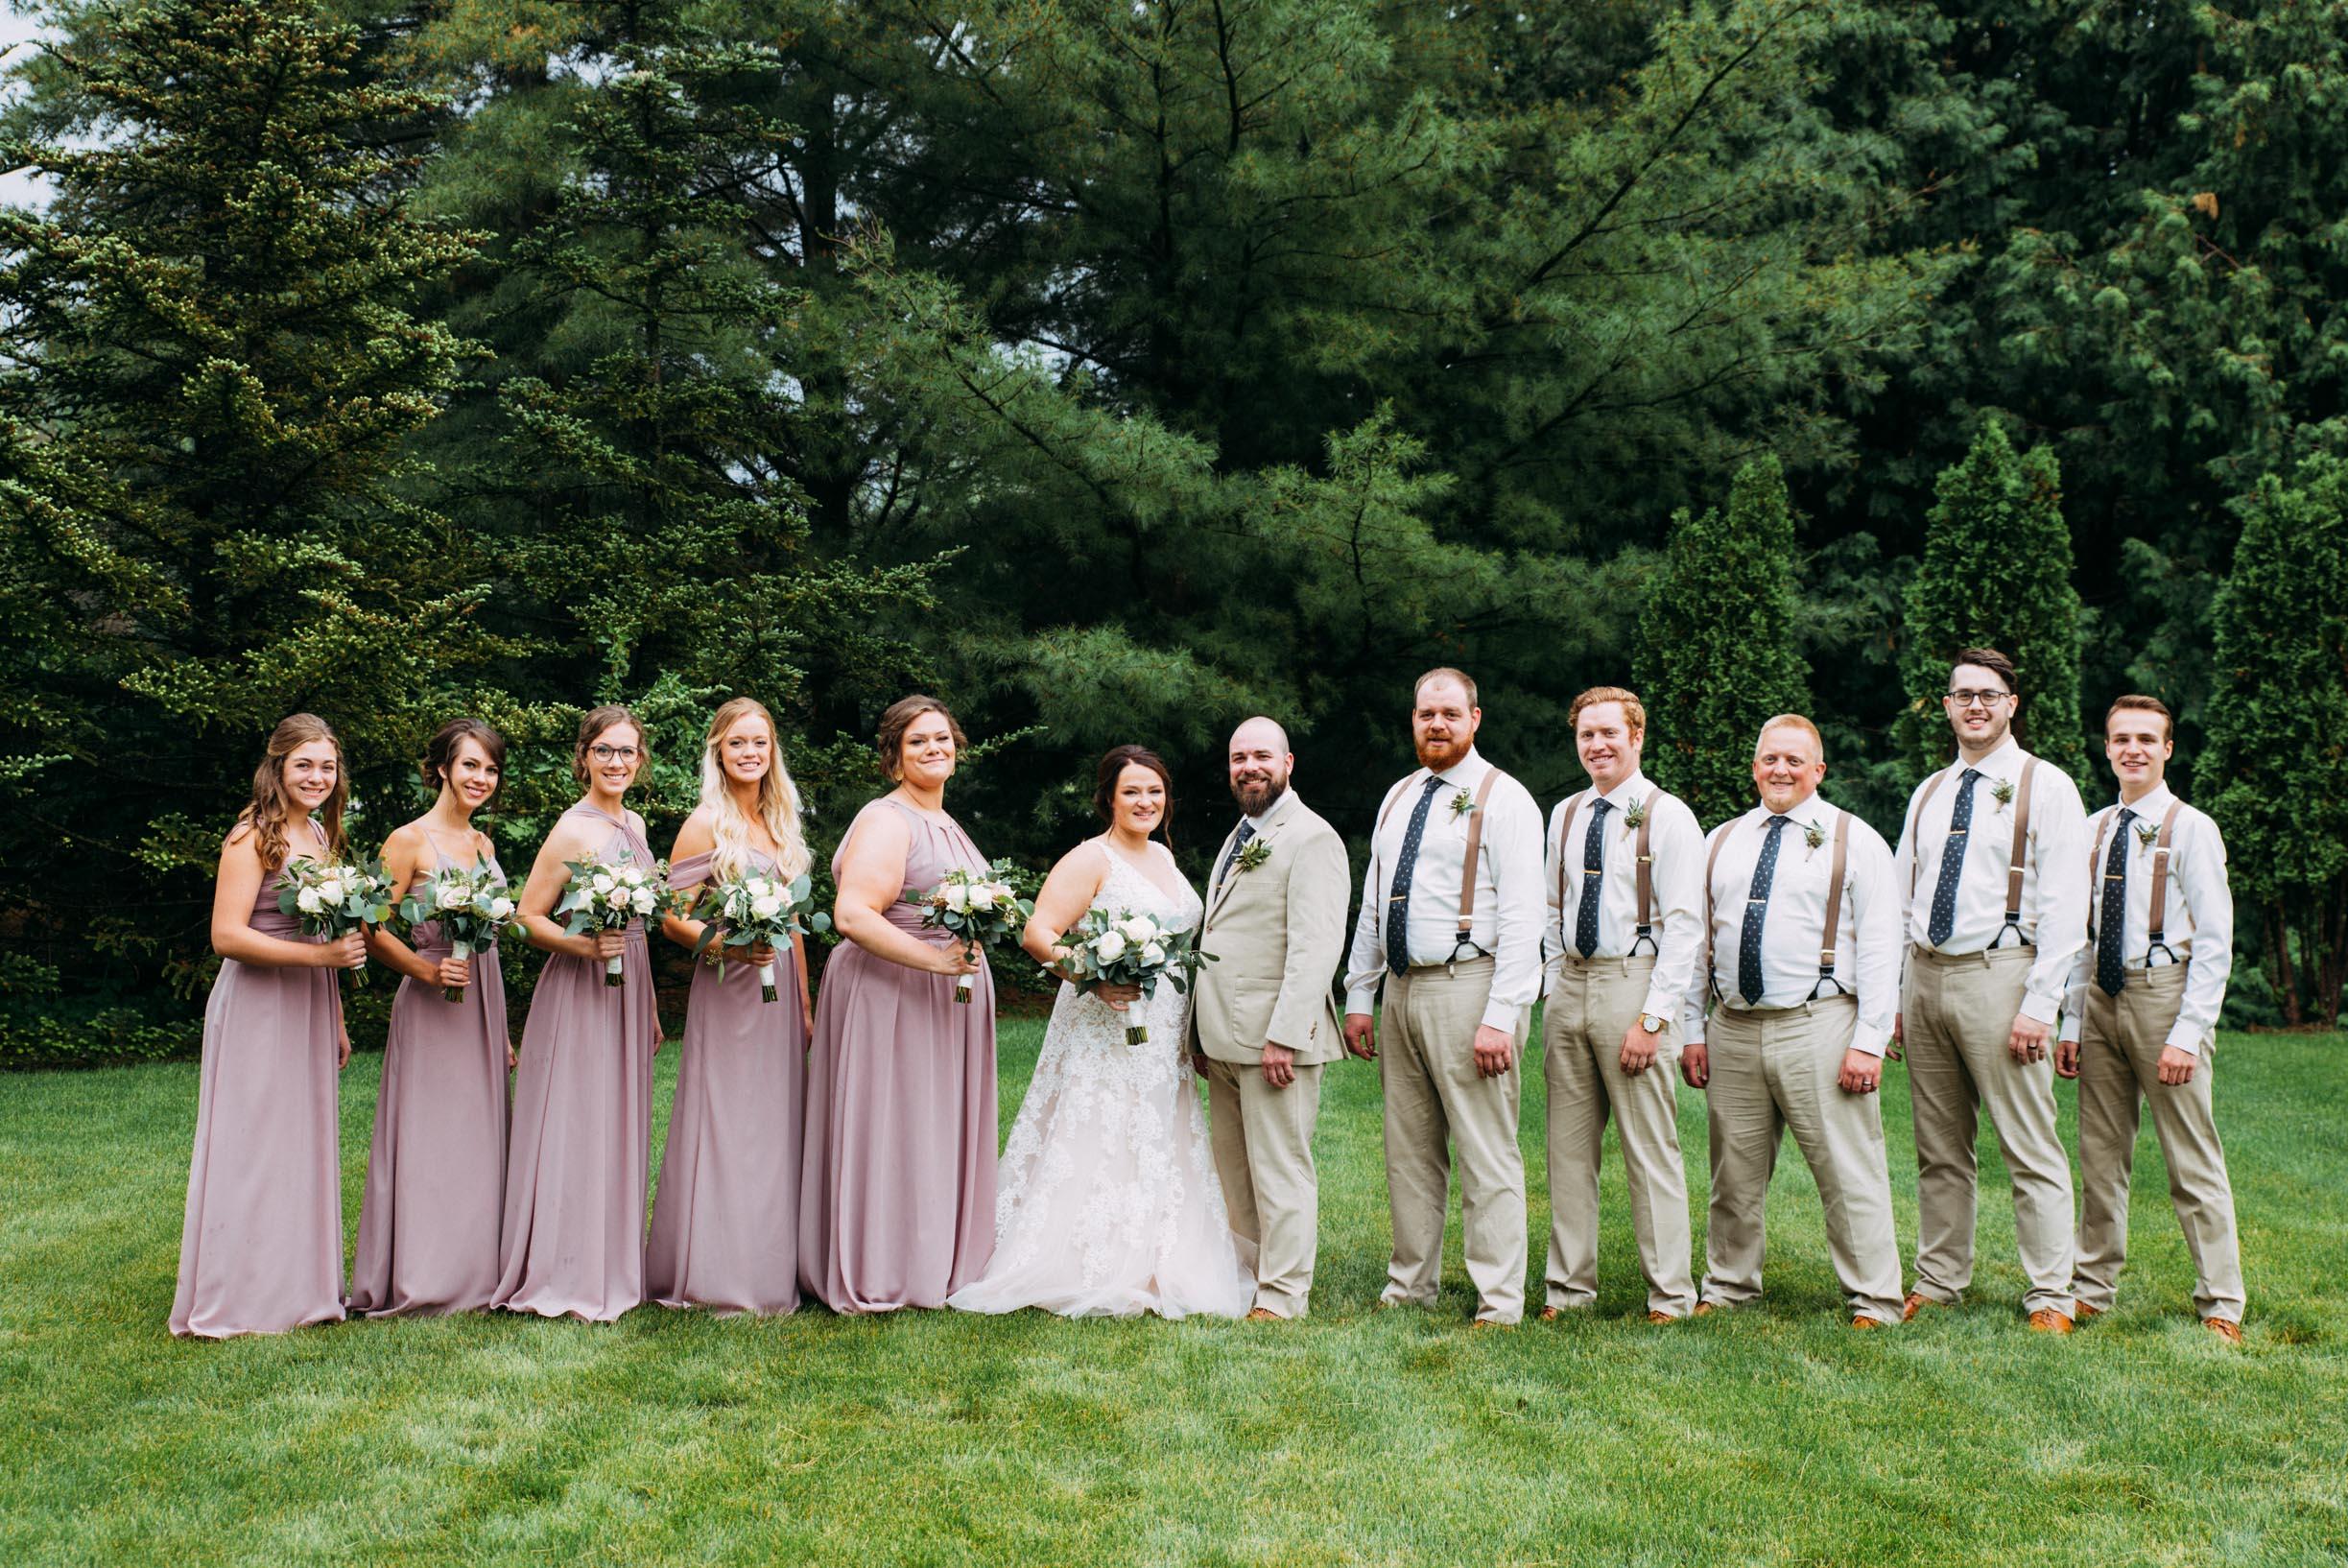 13-Jess_Jeremy_Minnesota_Wedding.jpg